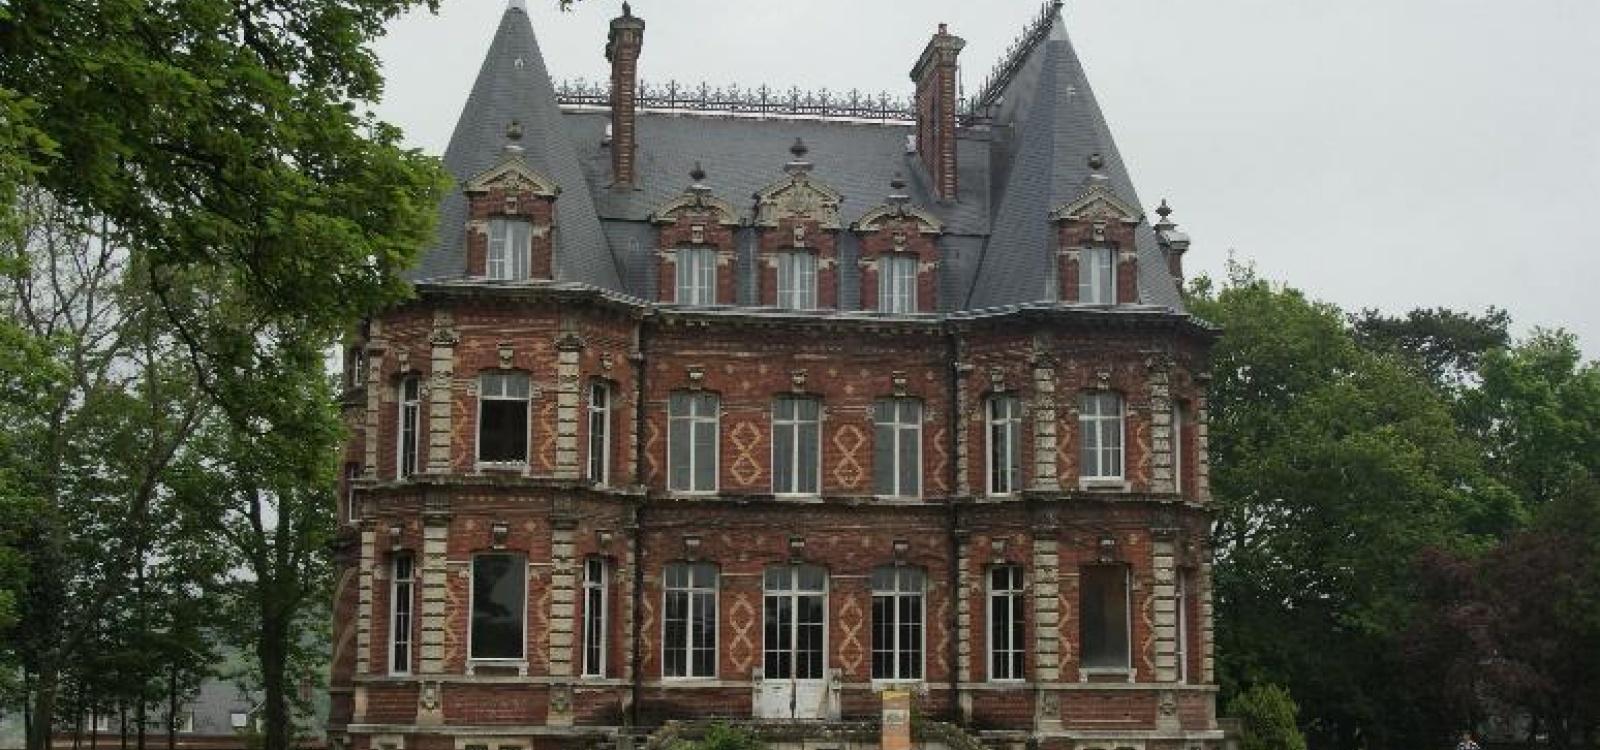 Lillebonne,Seine-Maritime,France,Château,1044